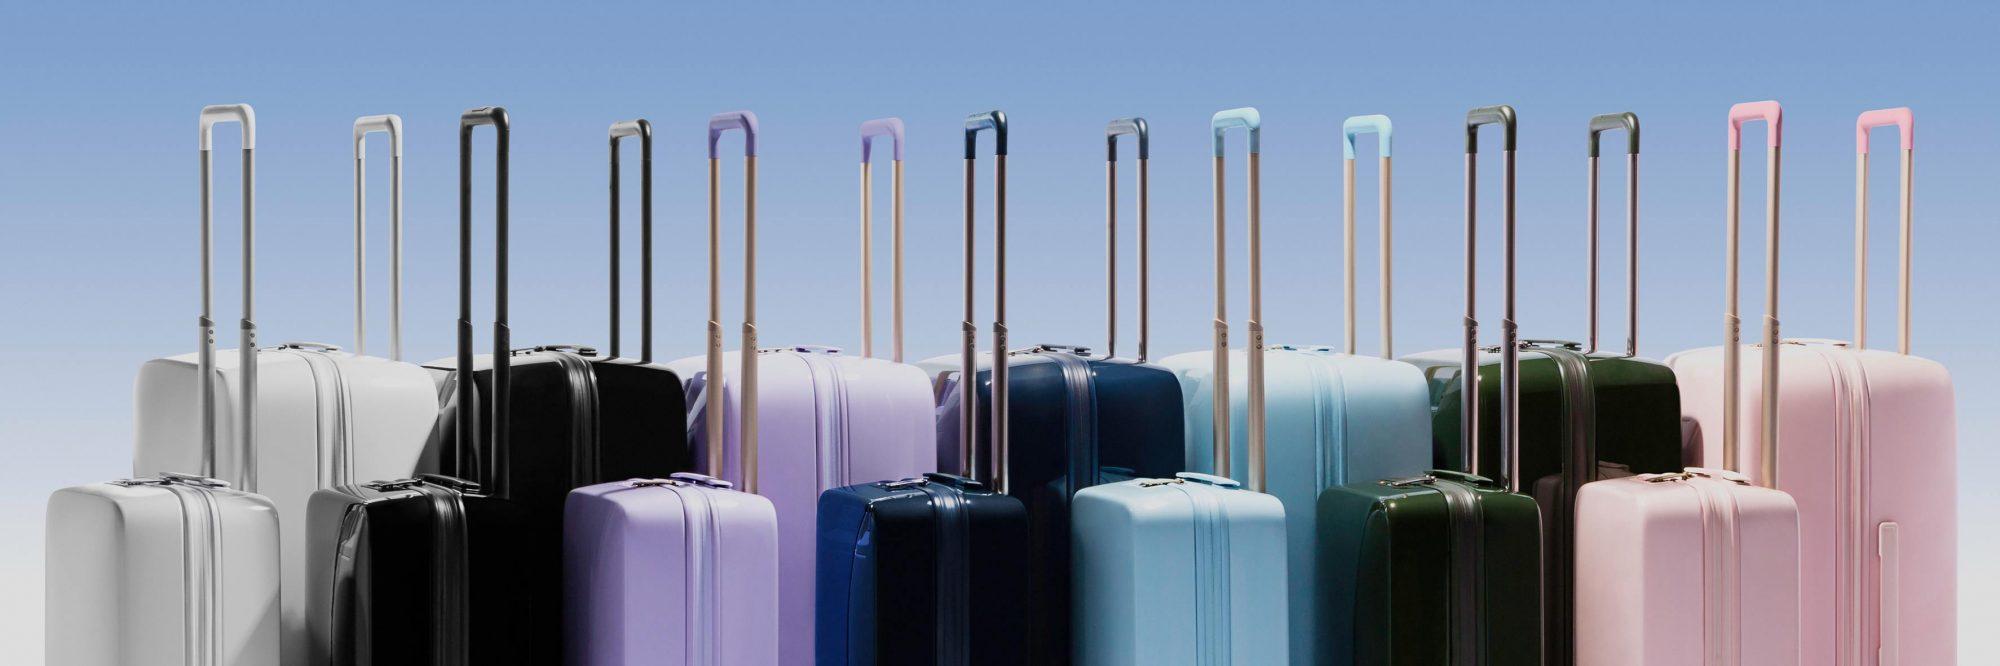 raden smart luggage colors